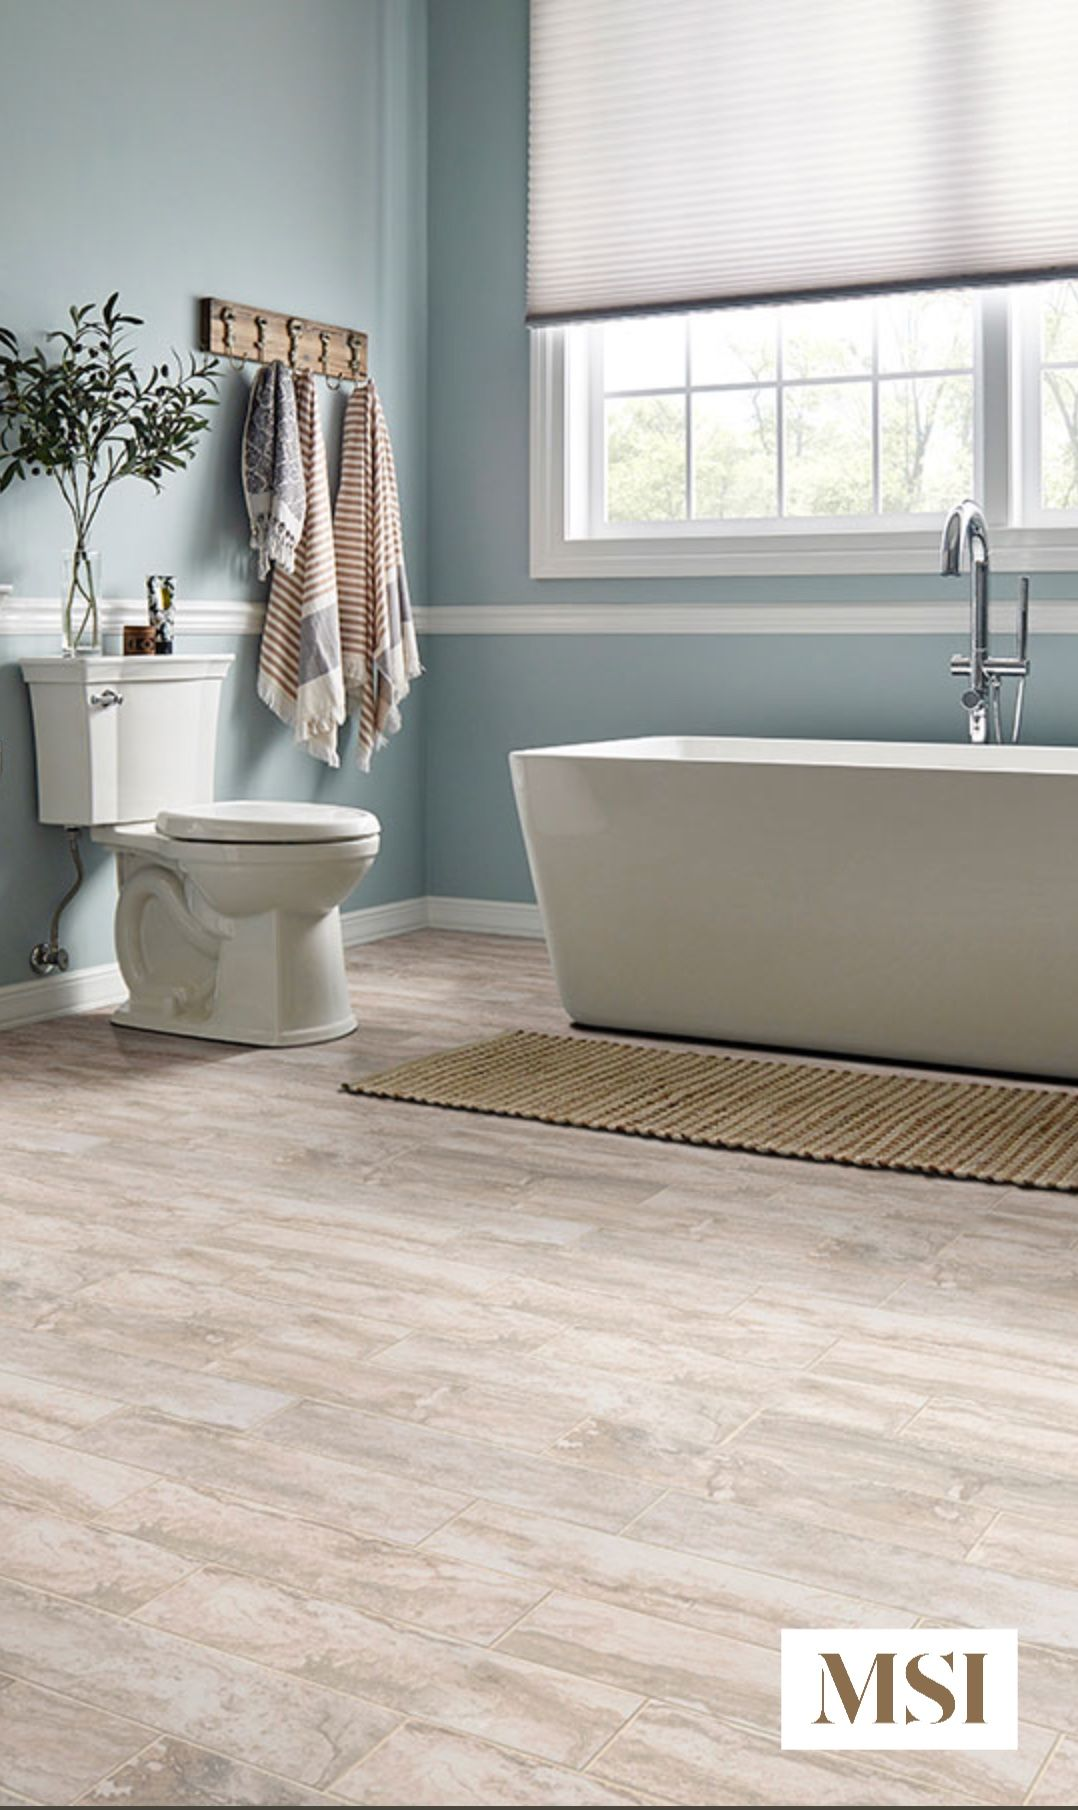 Pietra Bernini Bianco Porcelain Tile In 2020 Elegant Tiles Porcelain Tile Home Interior Design